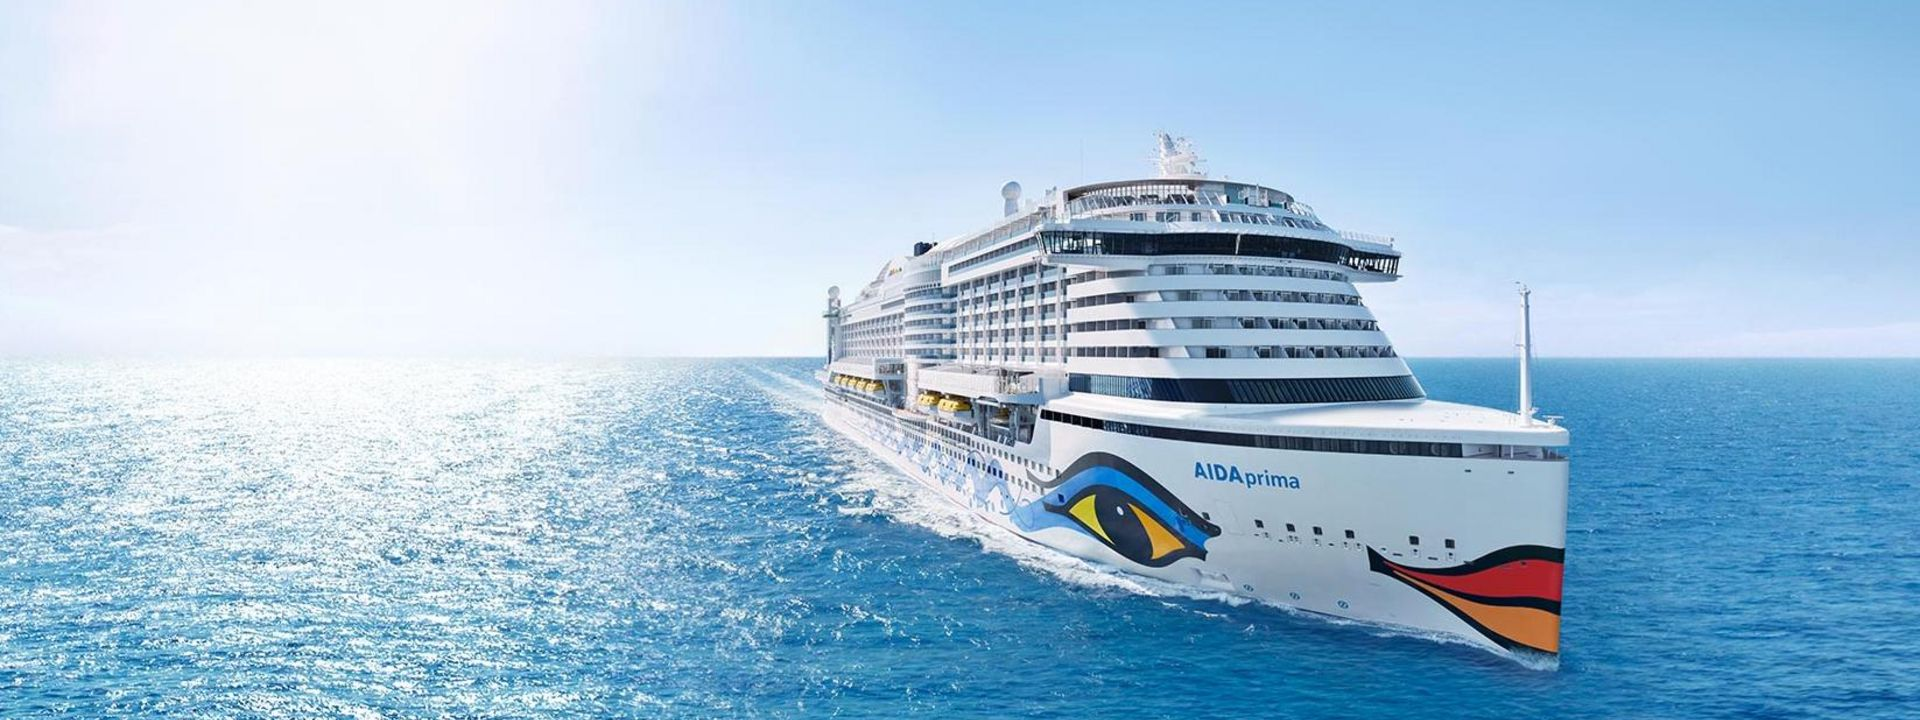 AIDA Cruises sagt Reisen bis 30. Juni ab